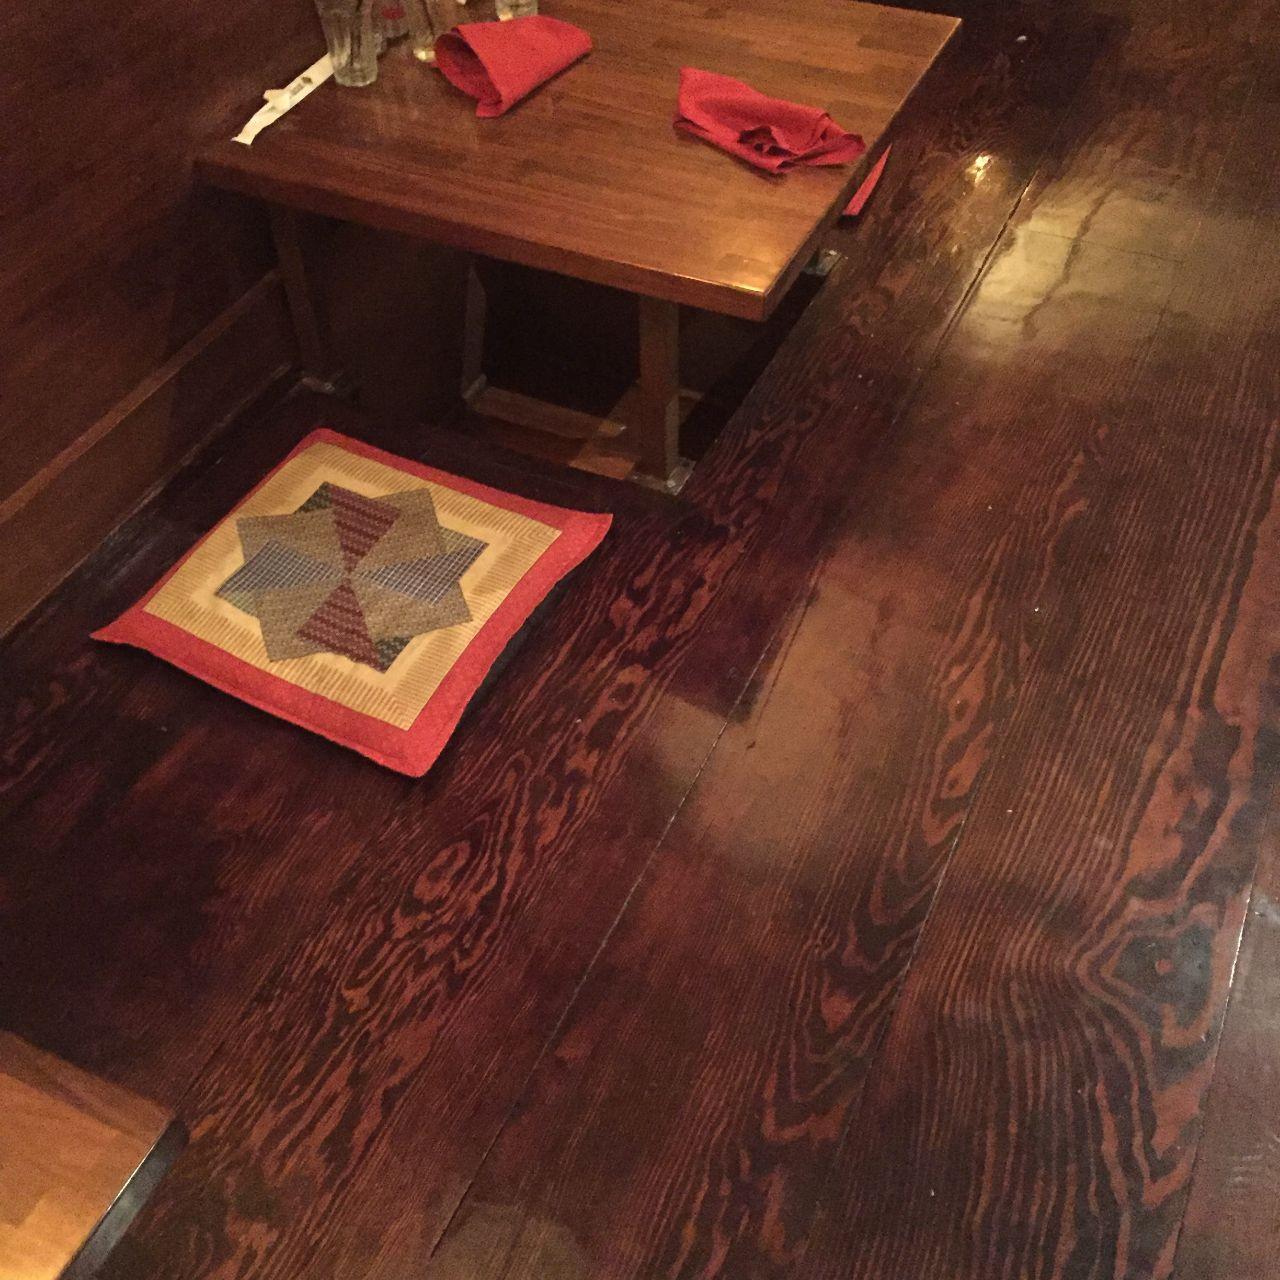 cheap hardwood flooring toronto of irori sushi restaurant marina del rey ca opentable with 25040265